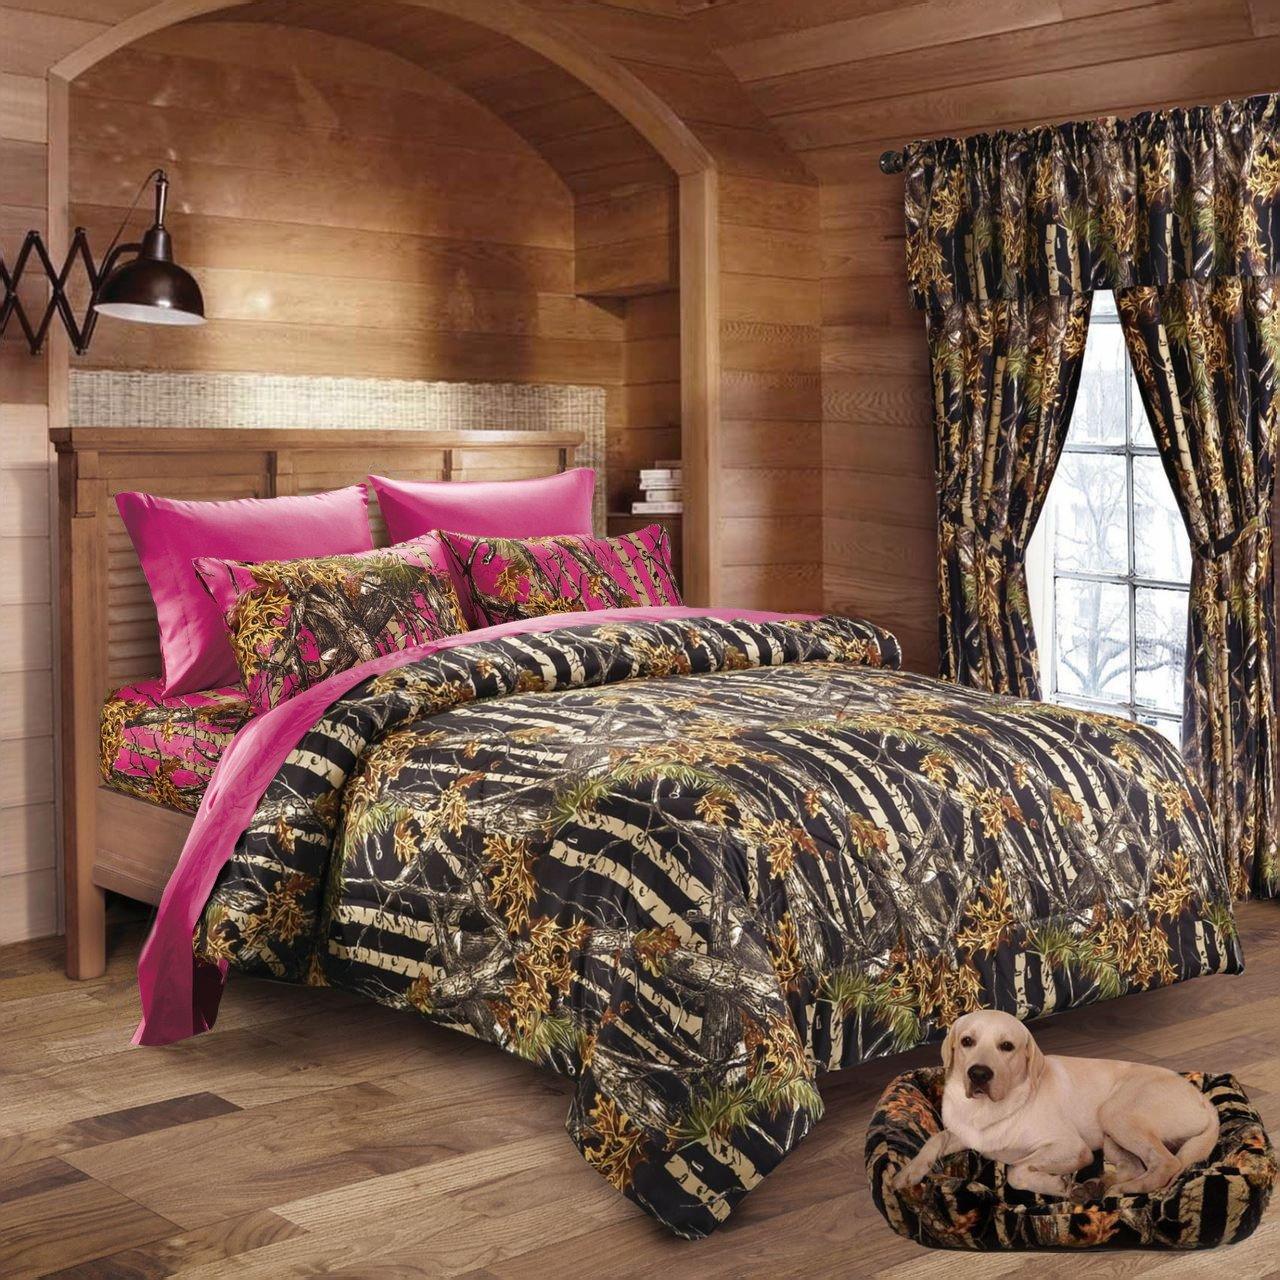 20 Lakes Hunter Camo Comforter, Sheet, Pillowcase Set Black & Hot Pink (Queen, Black & Hot Pink)